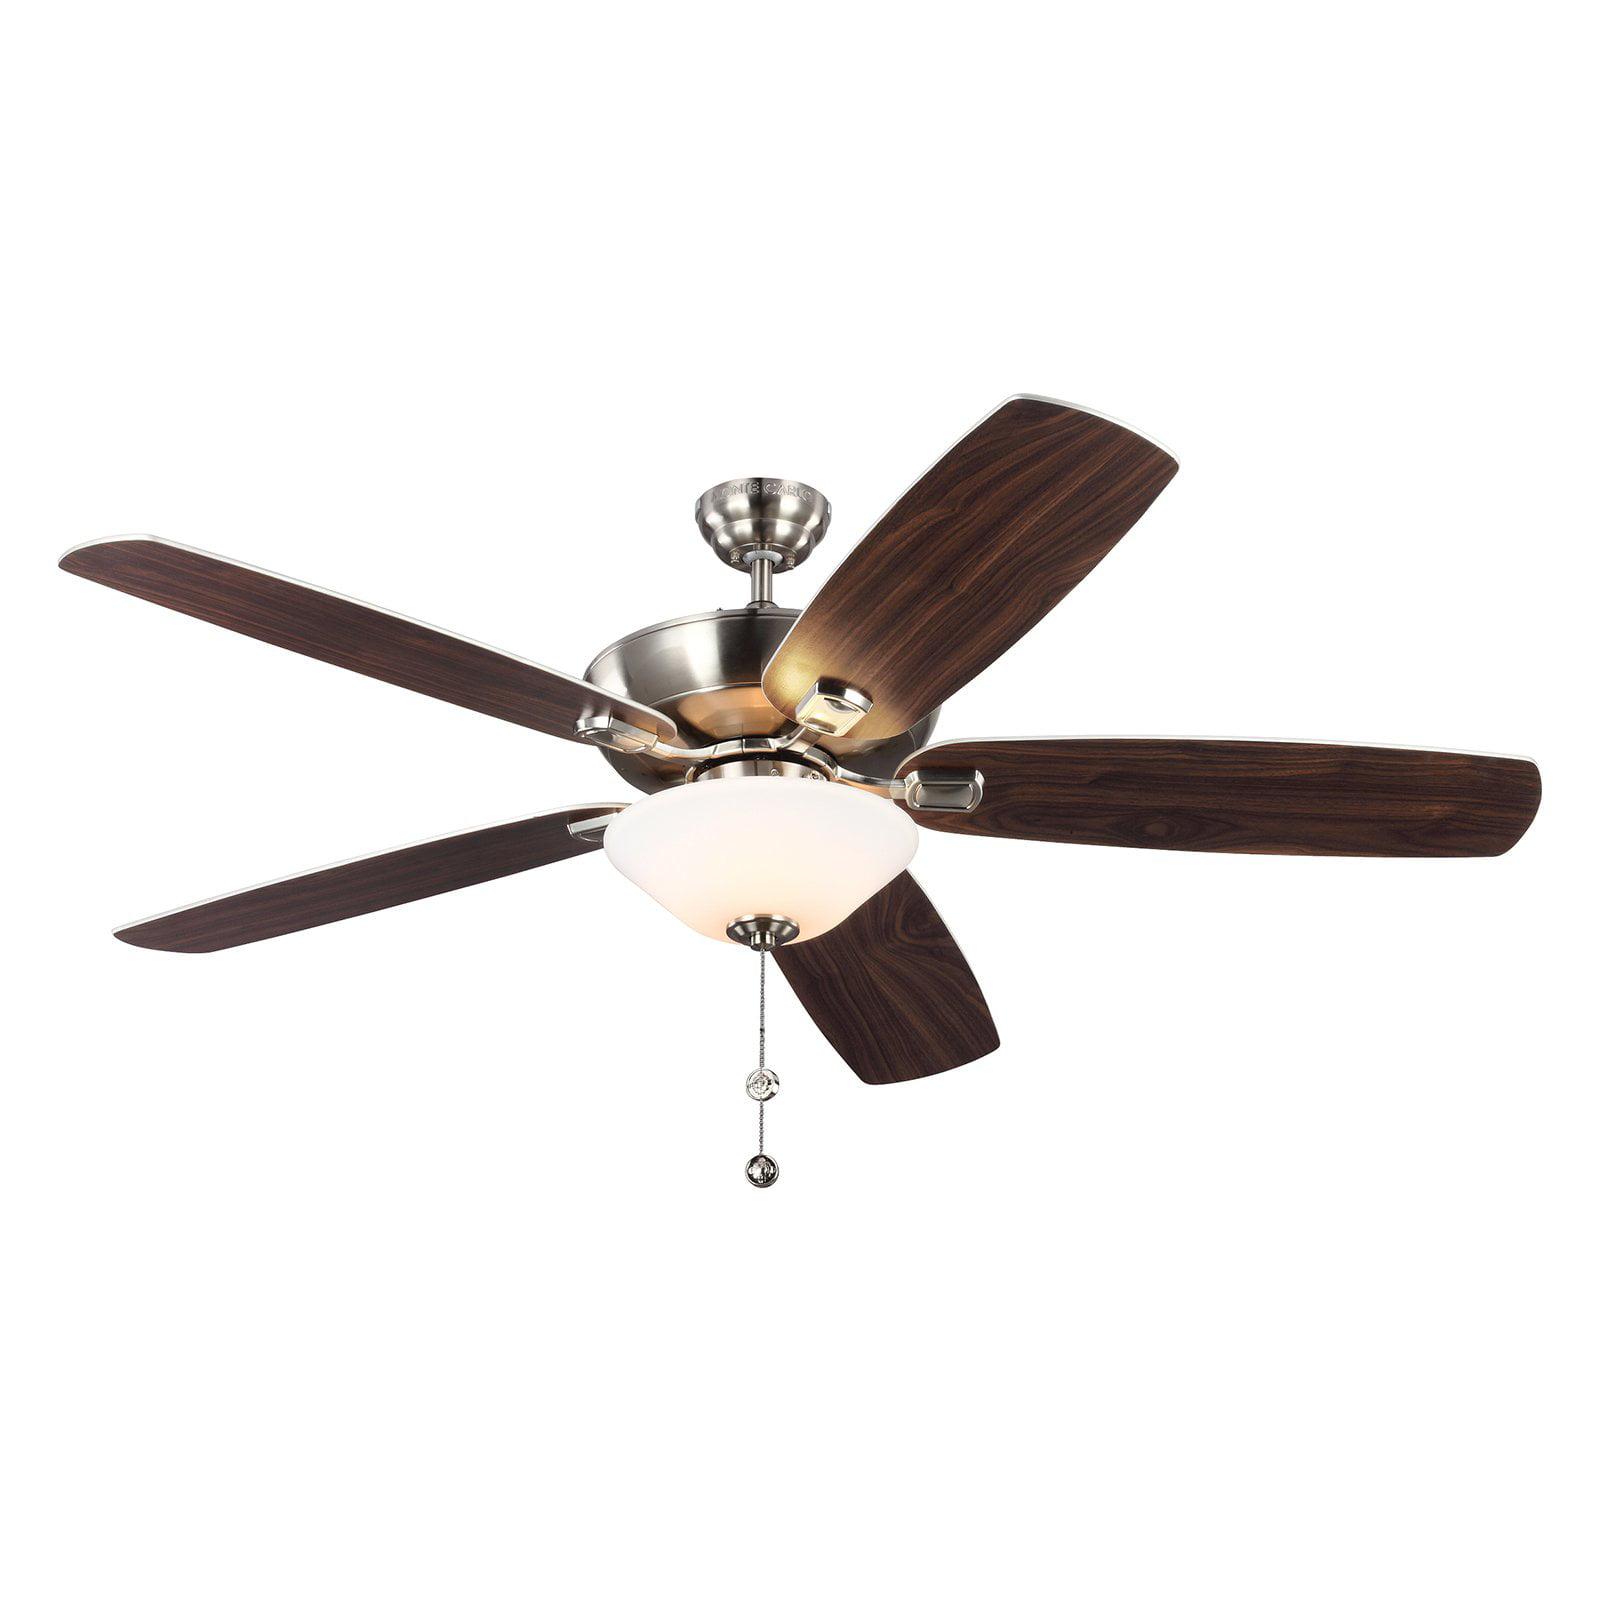 Monte Carlo Colony Super Max Plus 5csm60 Indoor Ceiling Fan Com